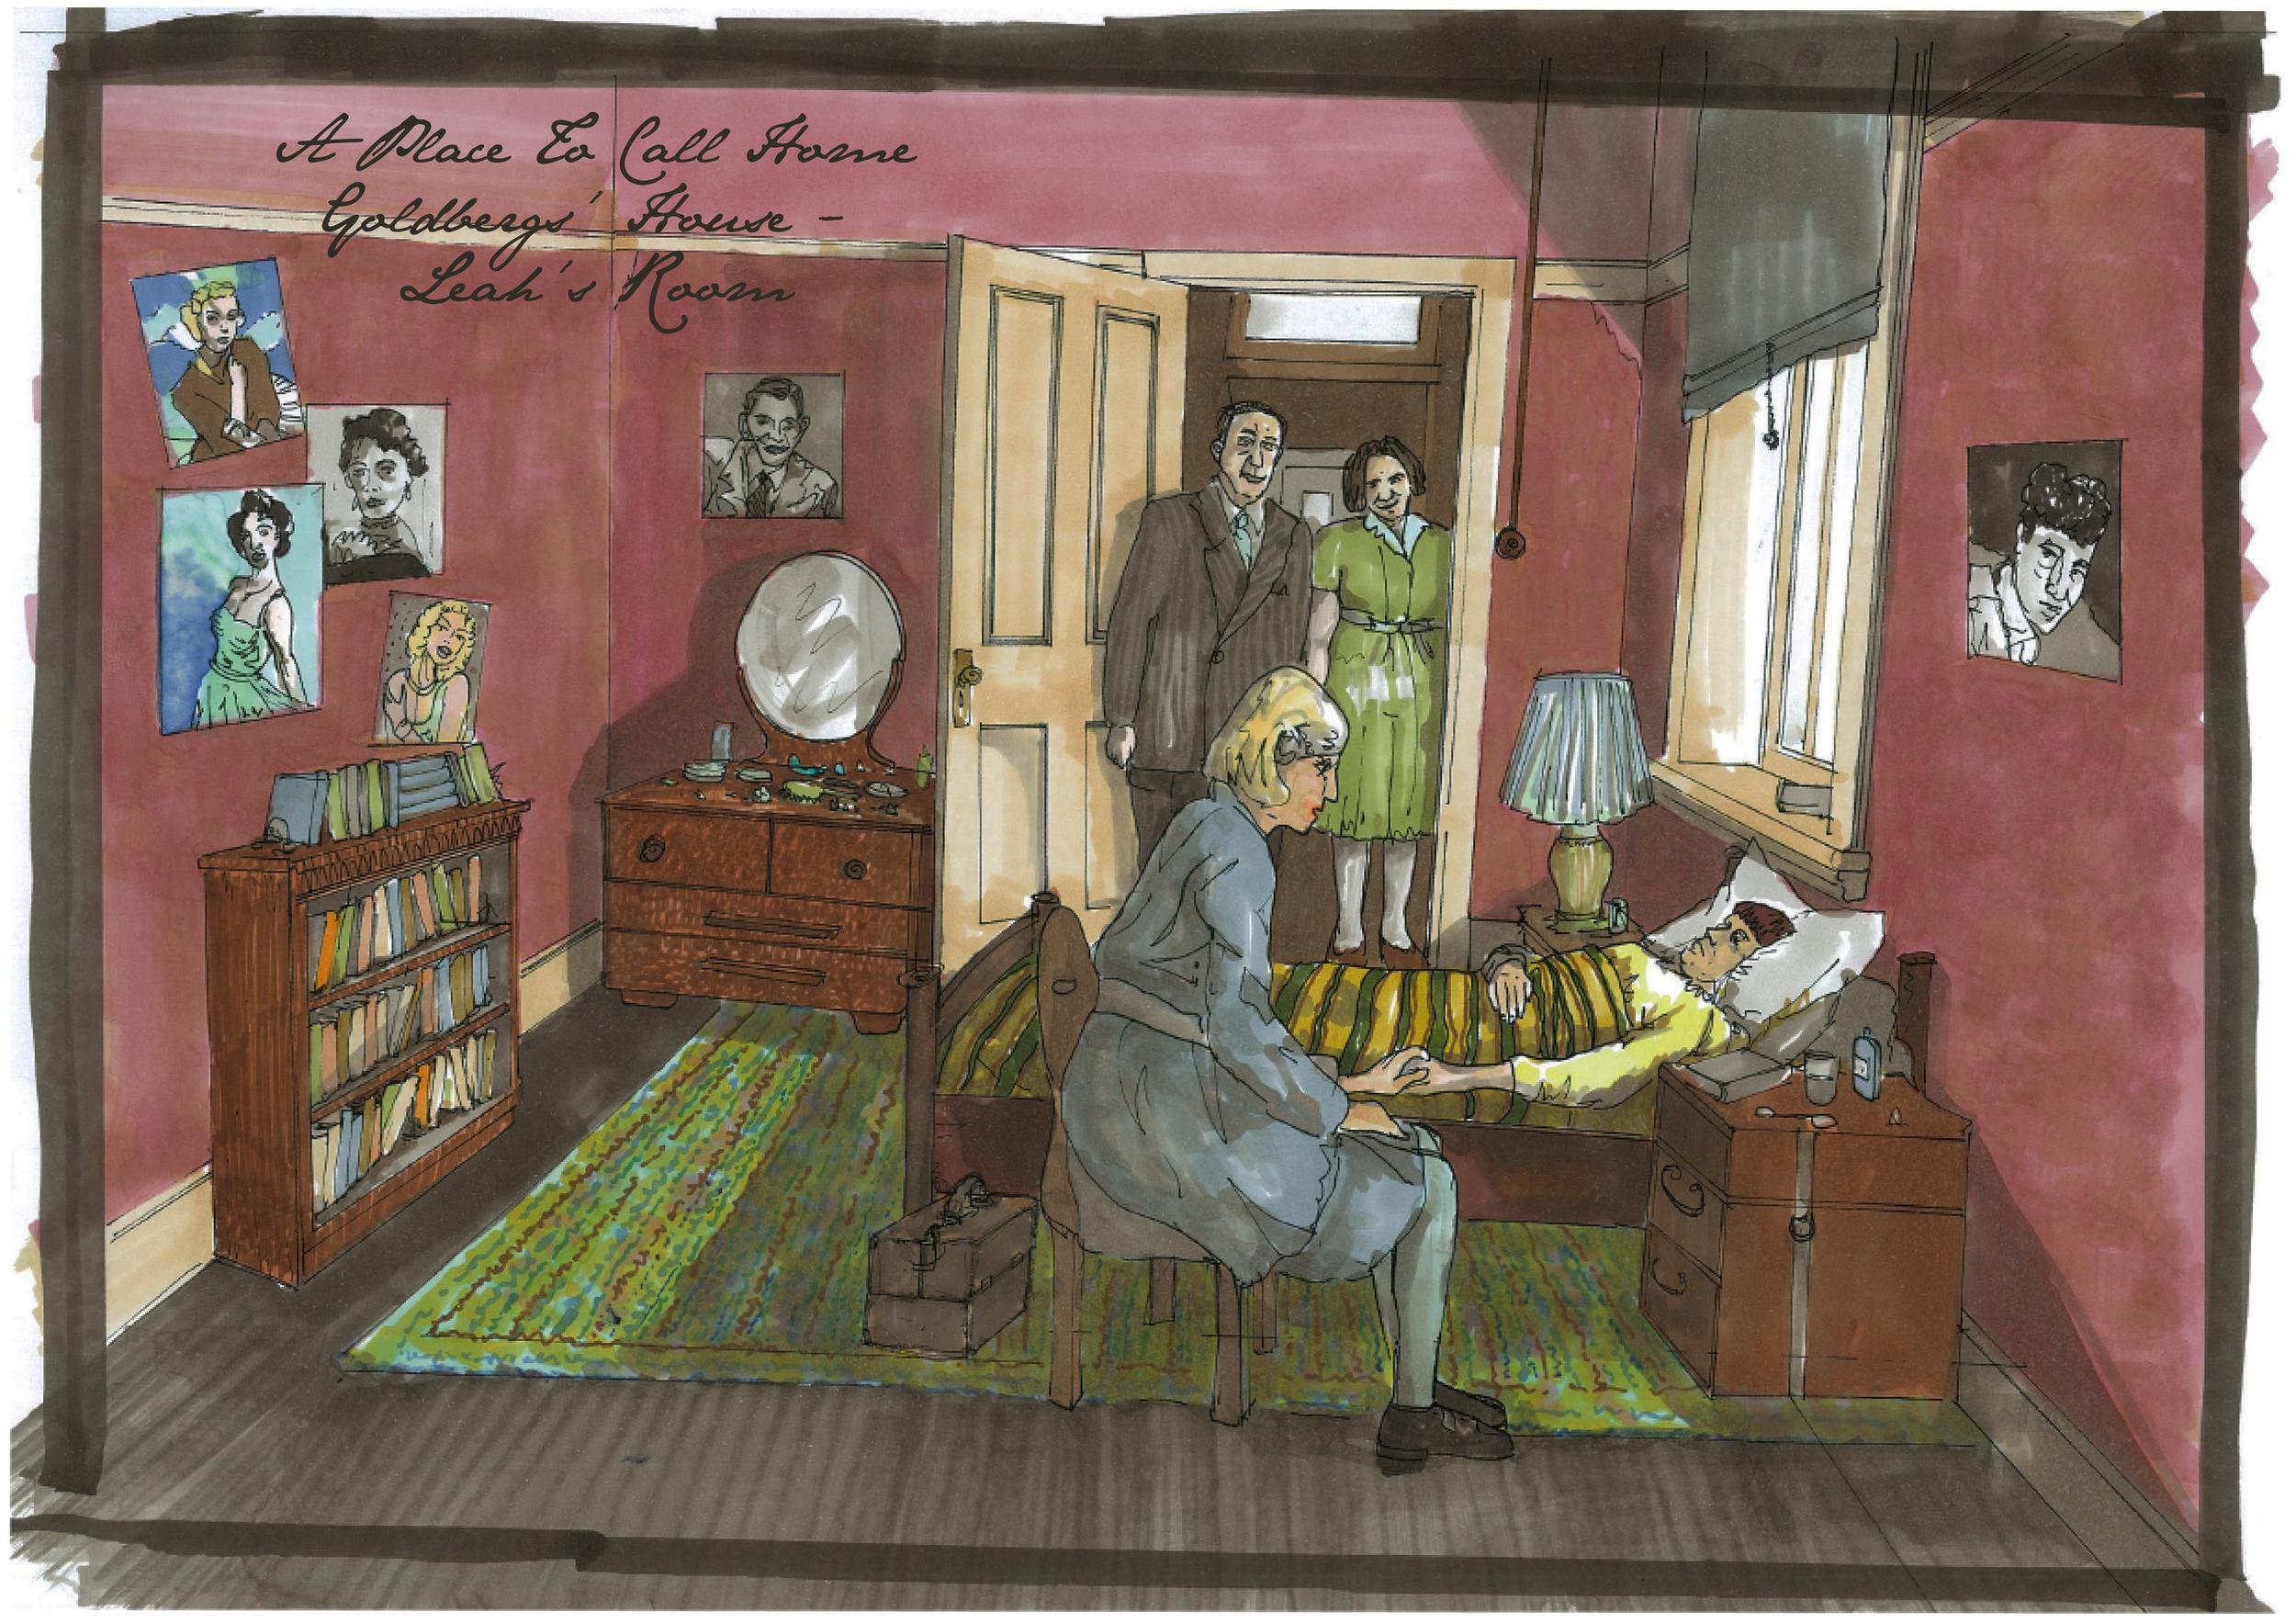 Goldbergs' House - Leah's Bedroom Concept.jpg